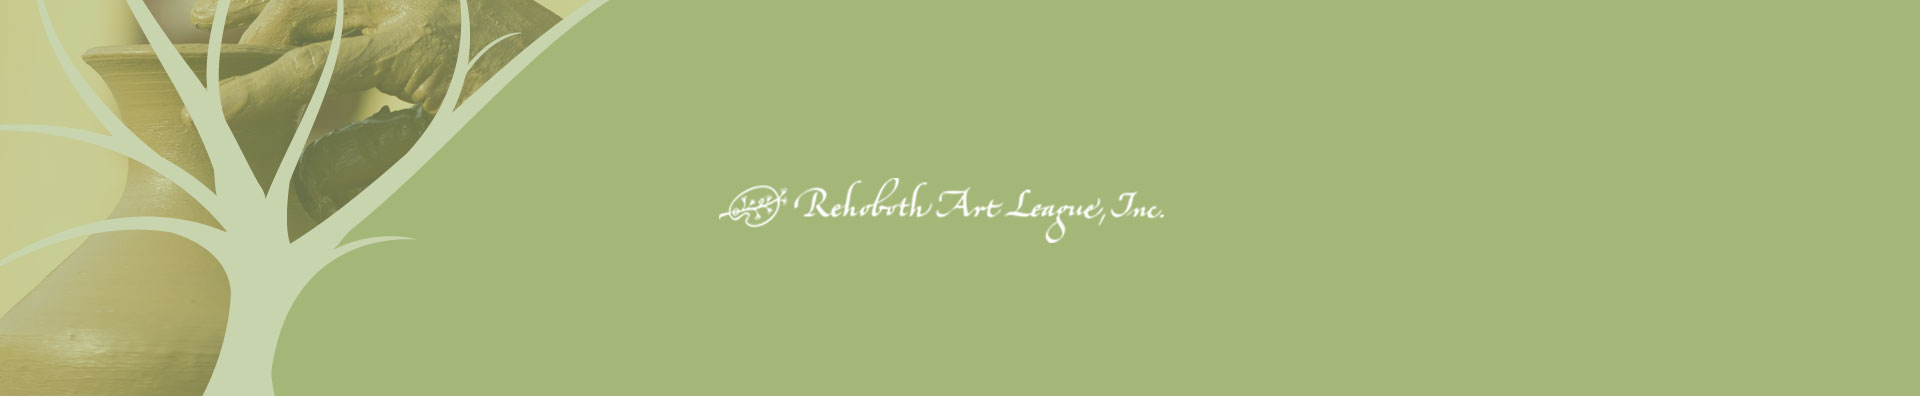 Rehoboth Art League